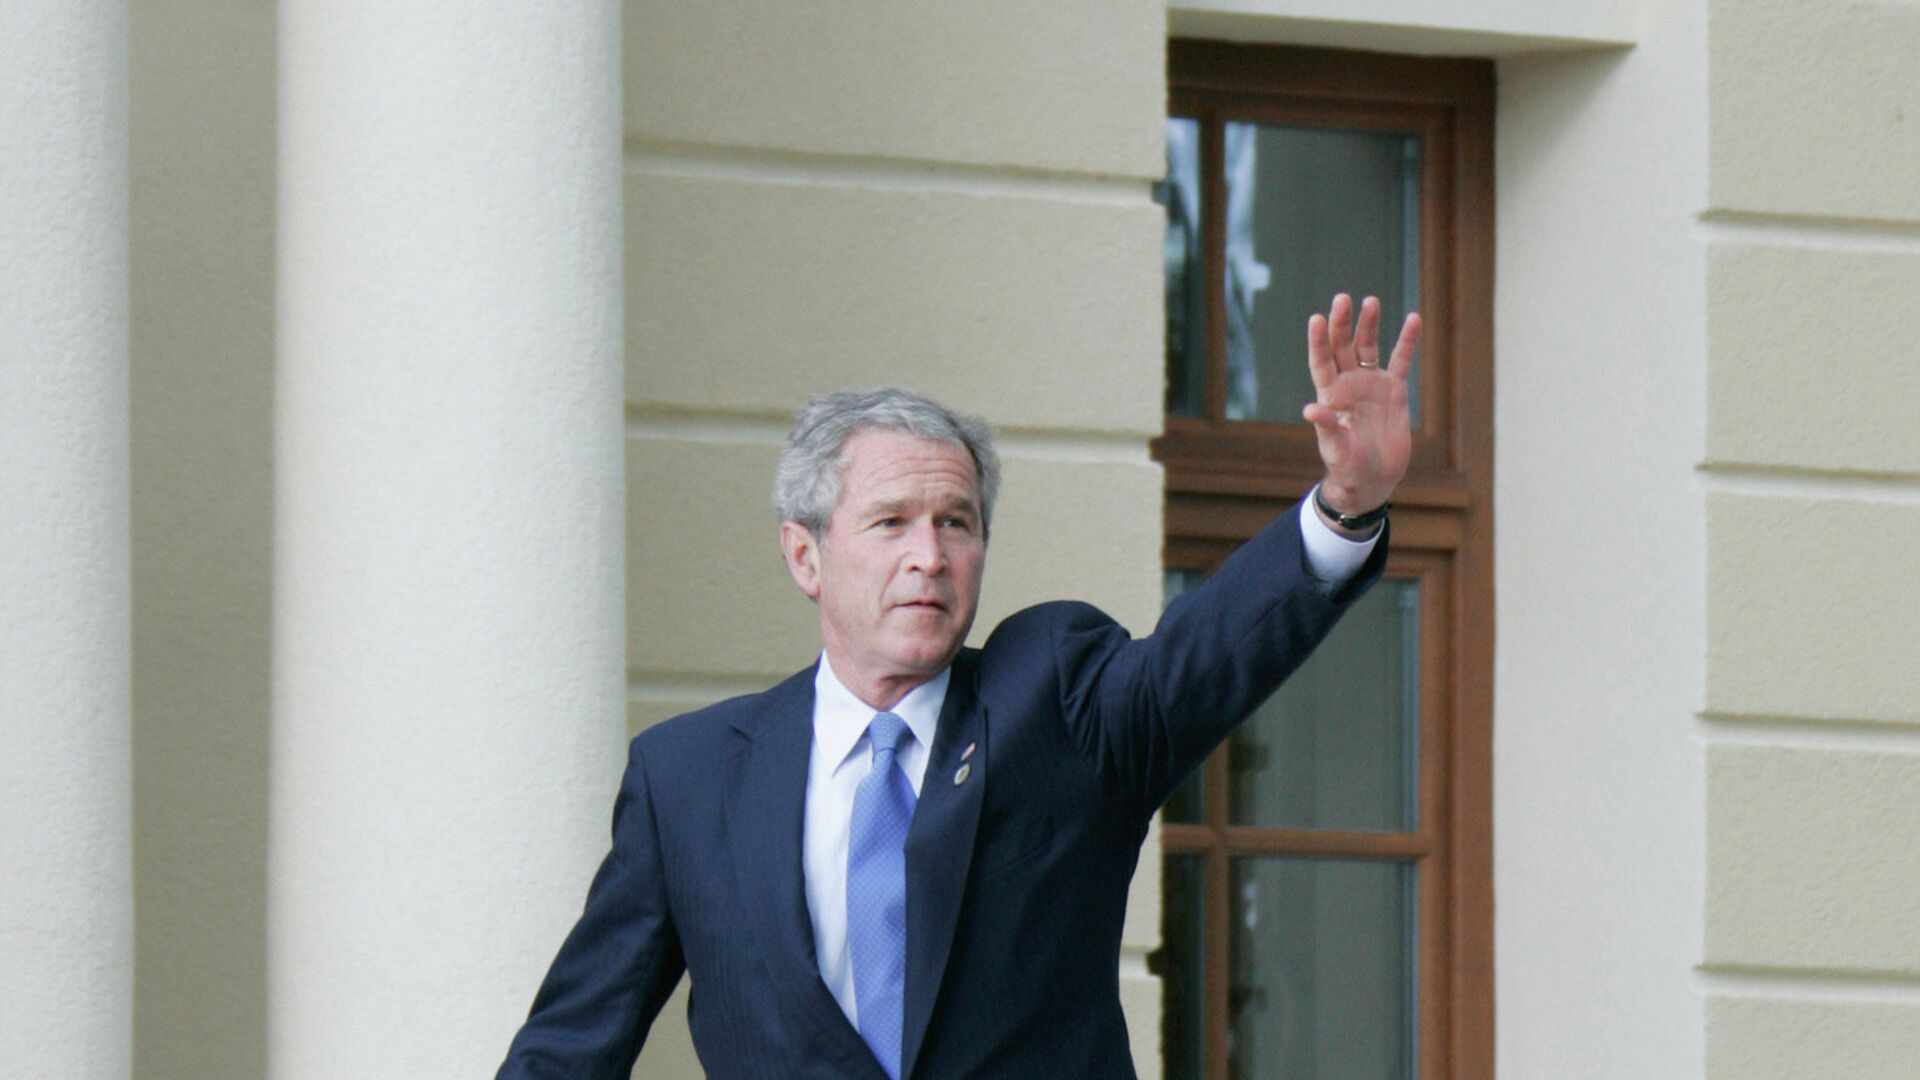 Джордж Буш младший, 43-й президент США. Архивное фото - РИА Новости, 1920, 11.09.2021